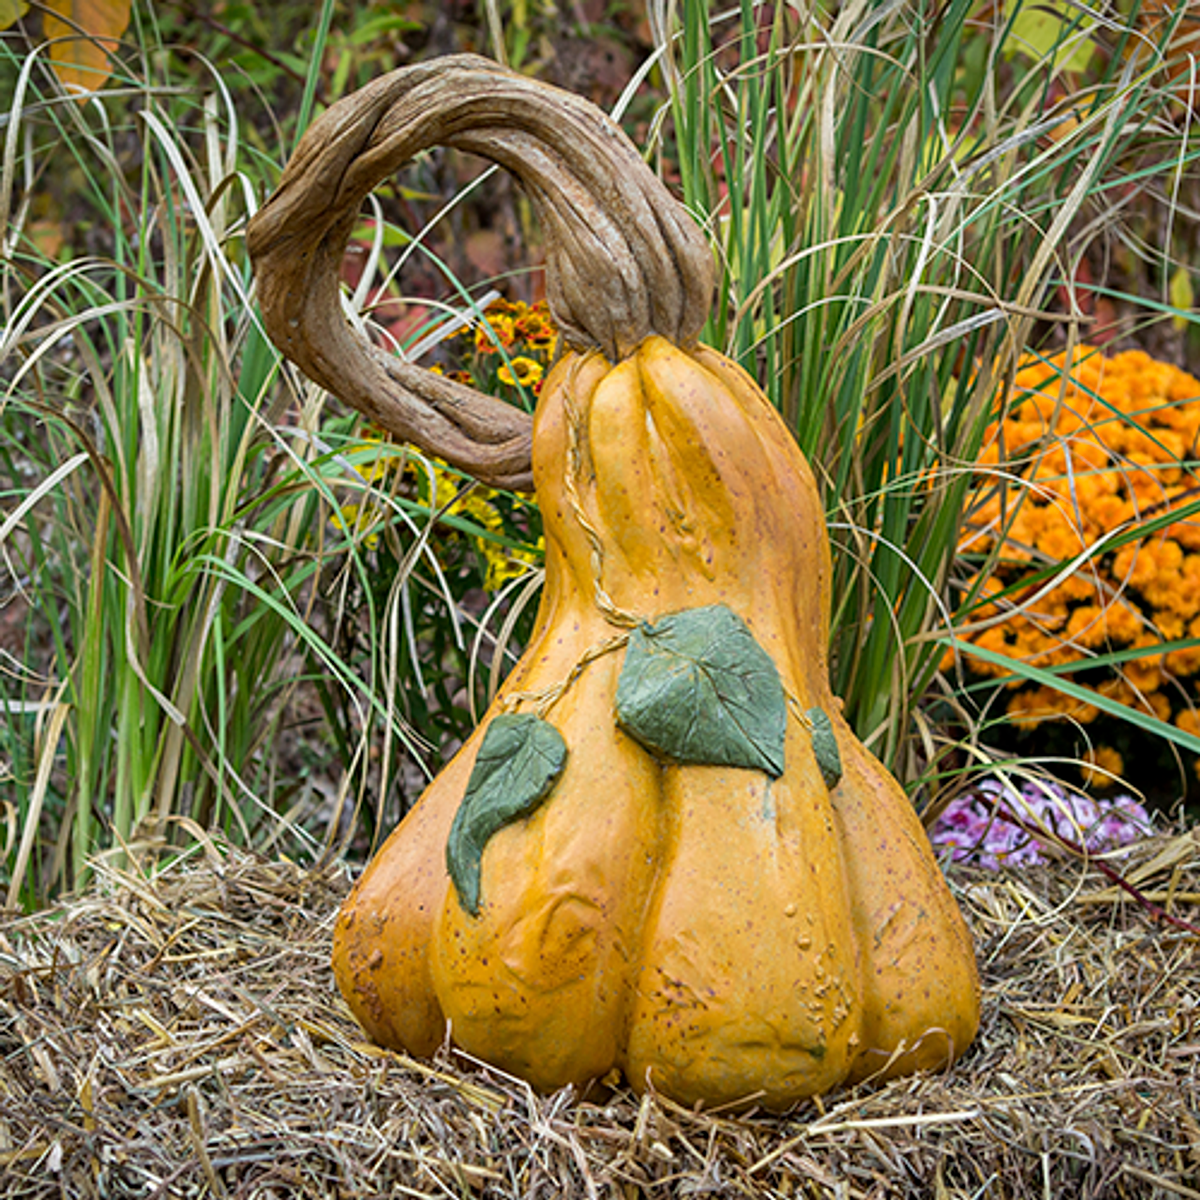 Autumn Gourd / Pumpkin